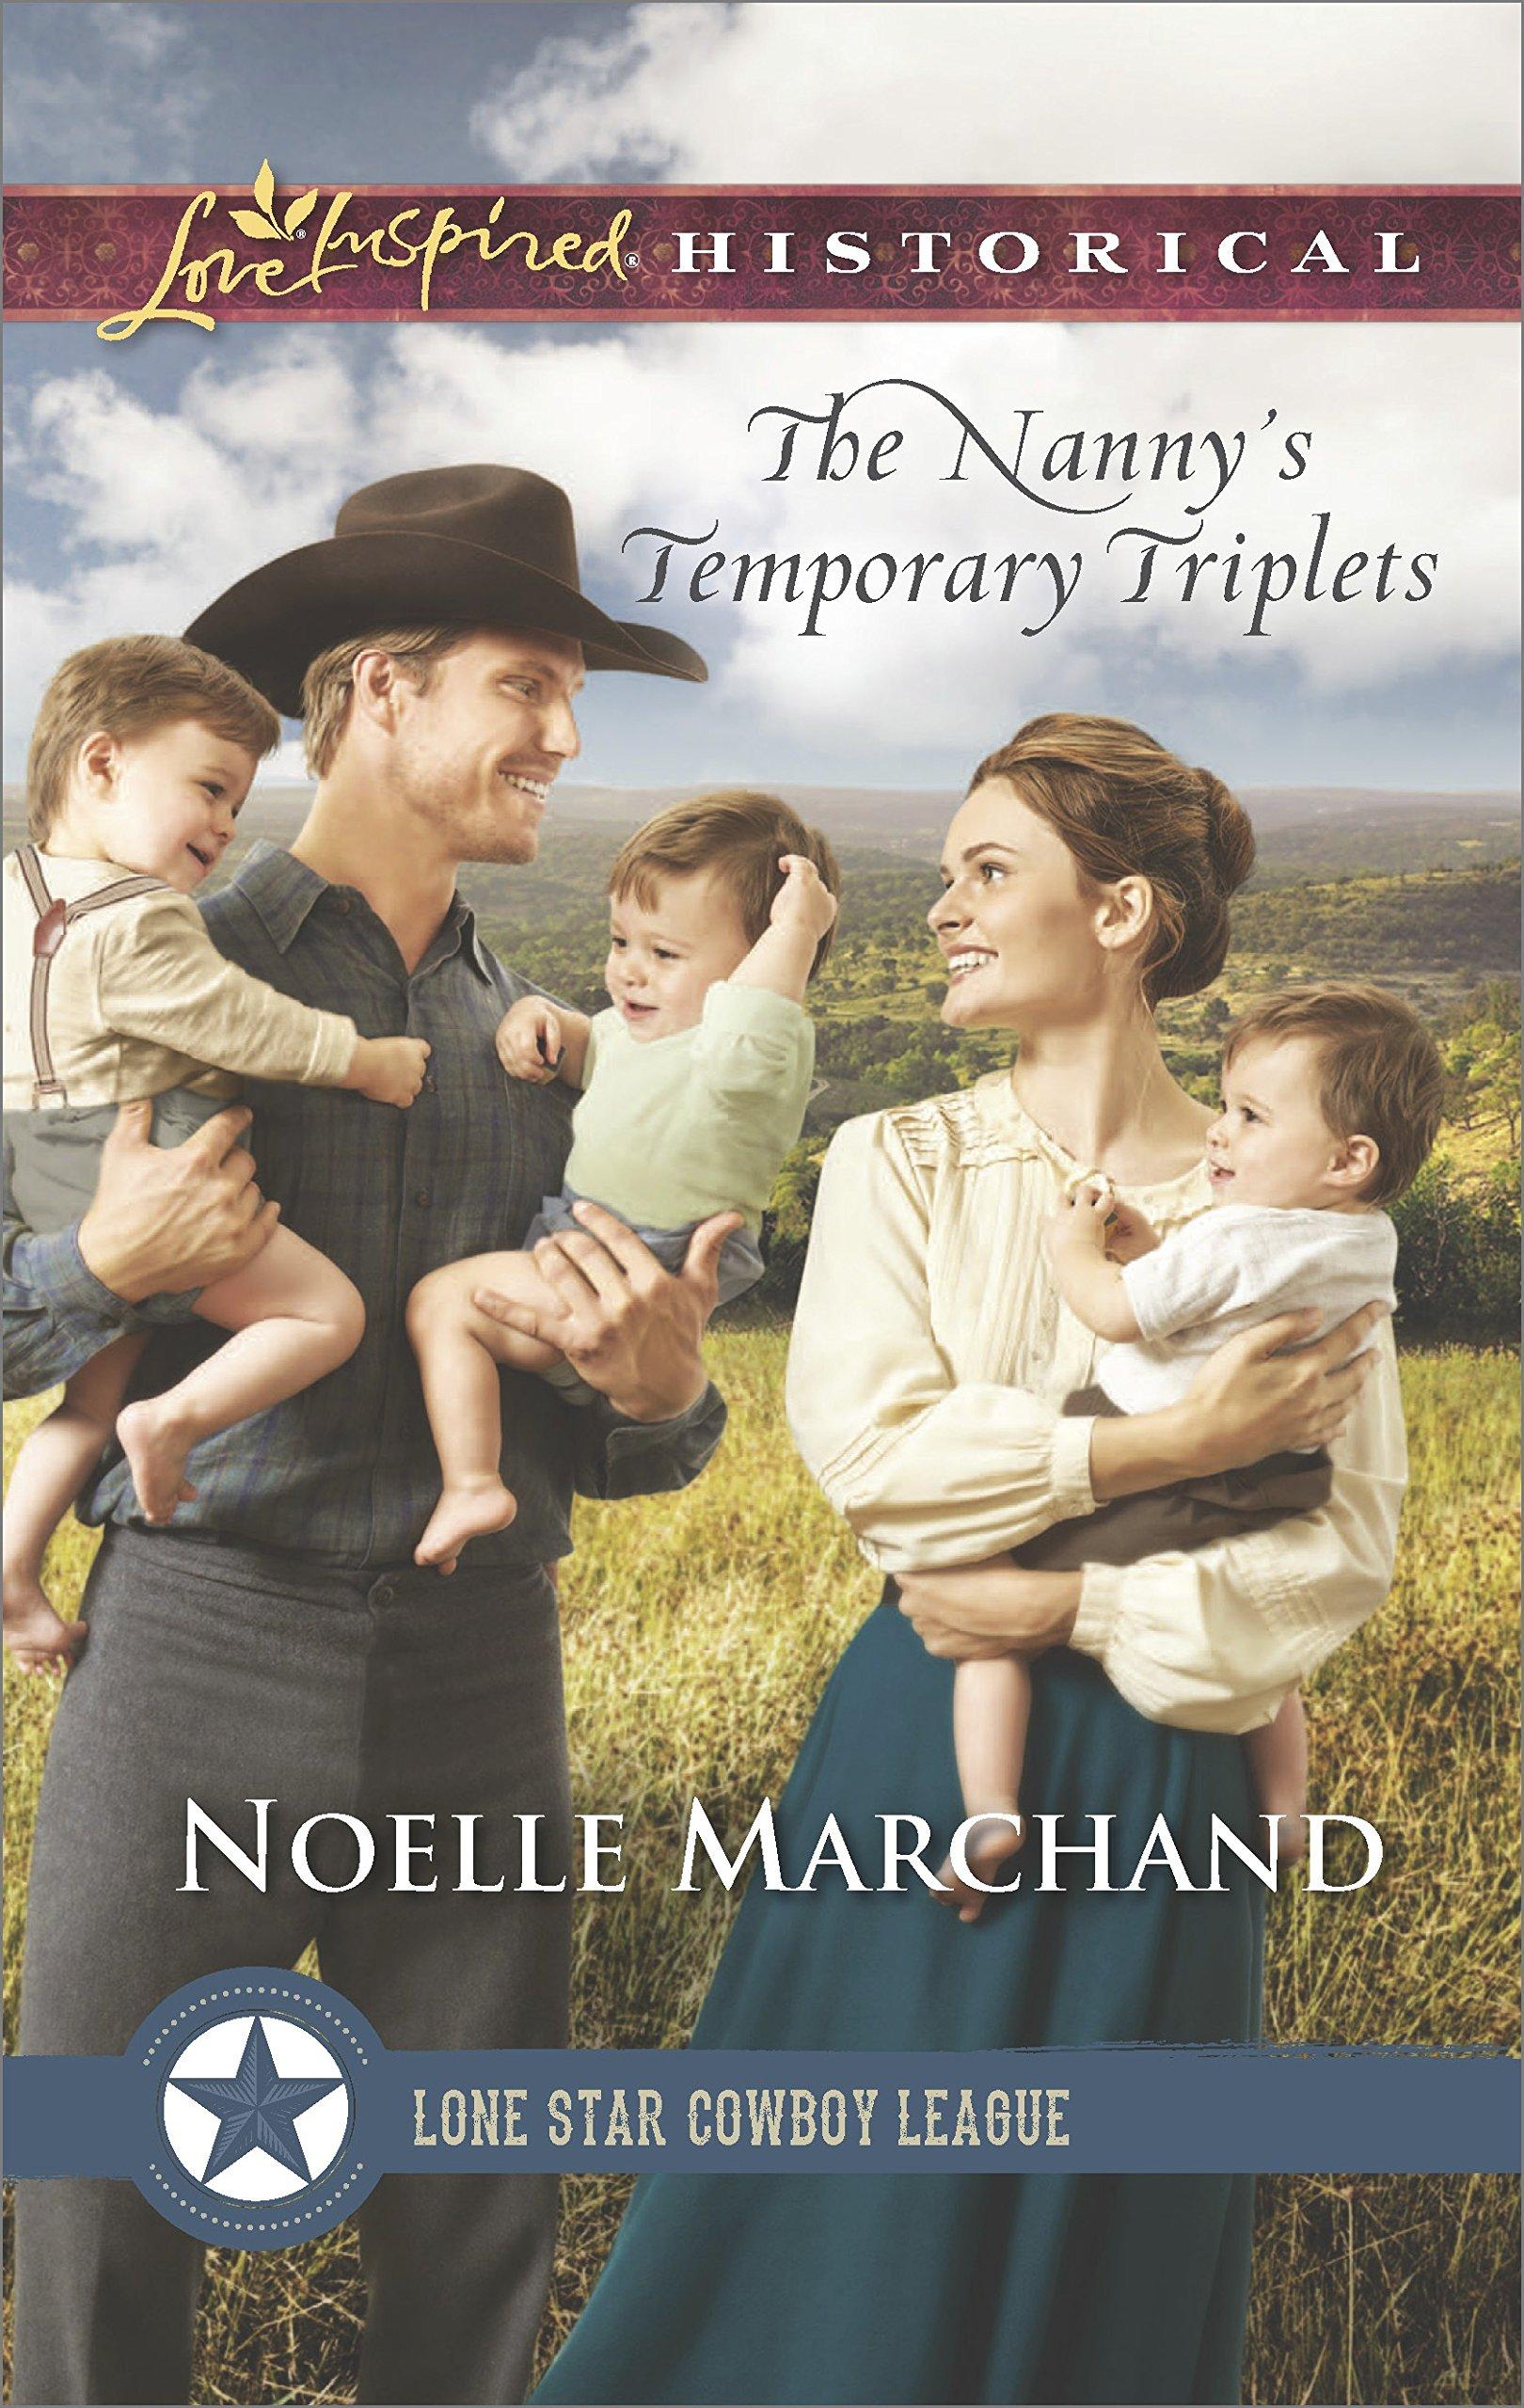 Nannys Temporary Triplets Cowboy League product image